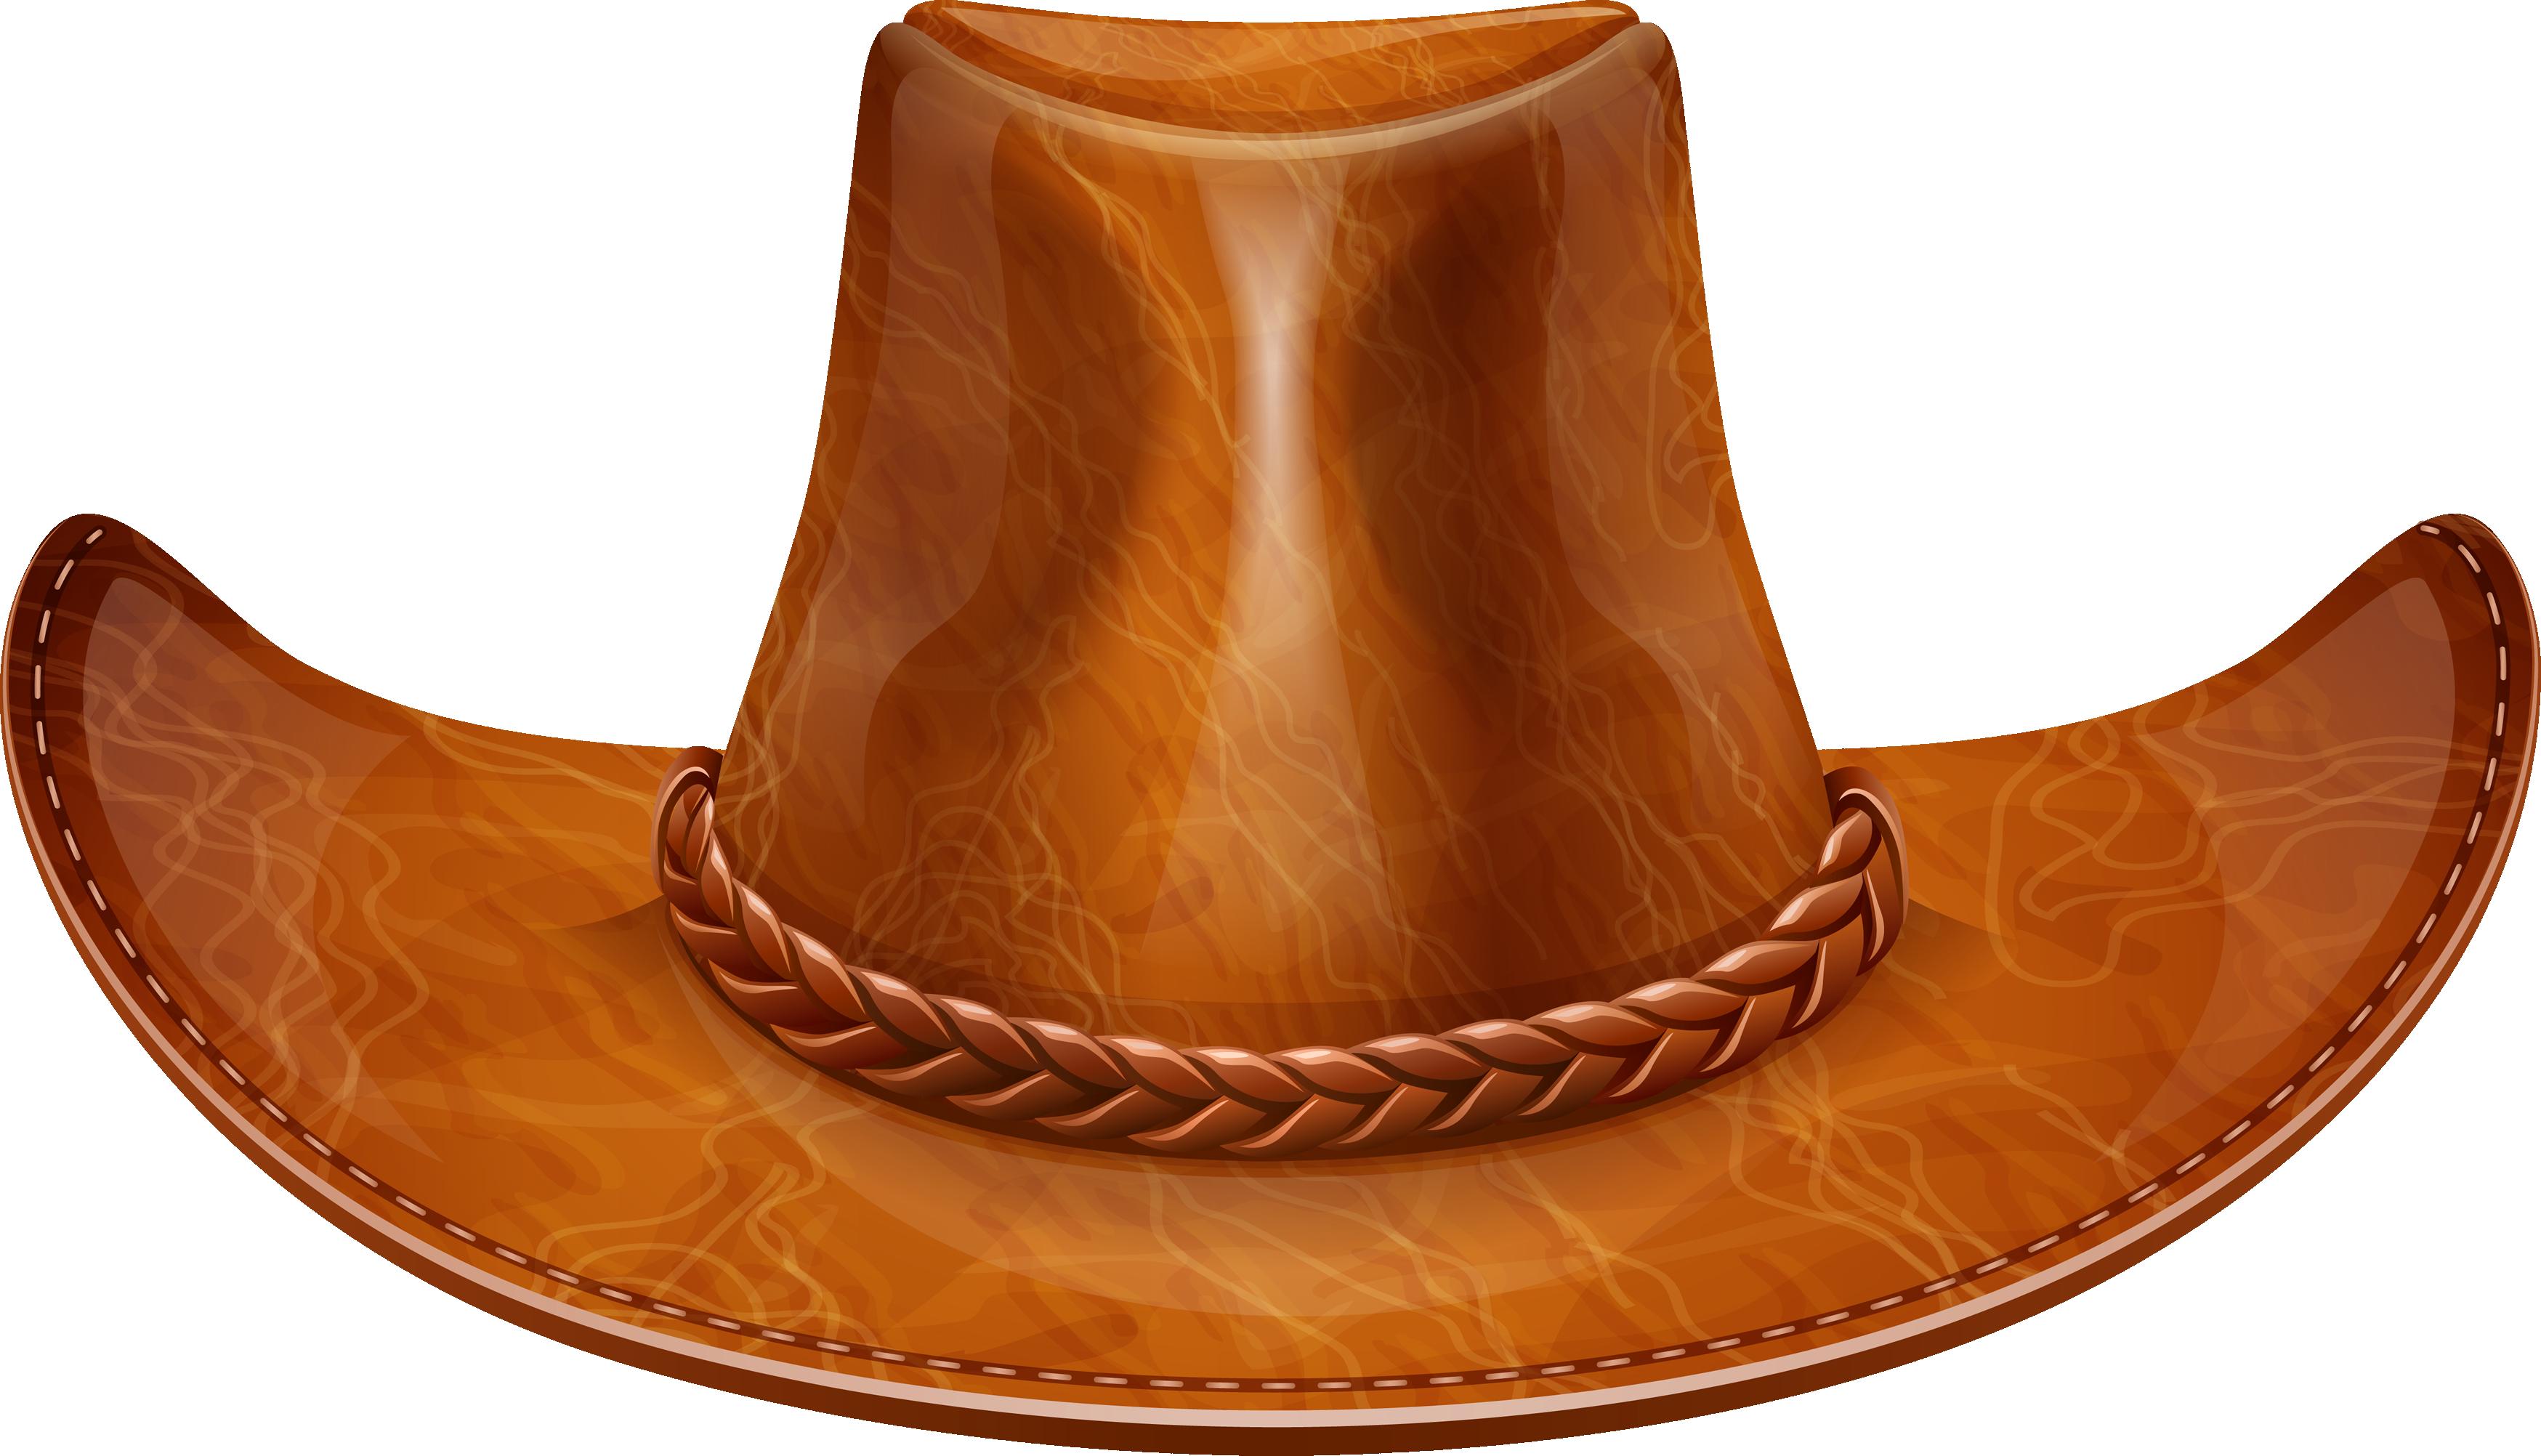 Brown Cow Boy Hat PNG Image - PurePNG   Free transparent ...